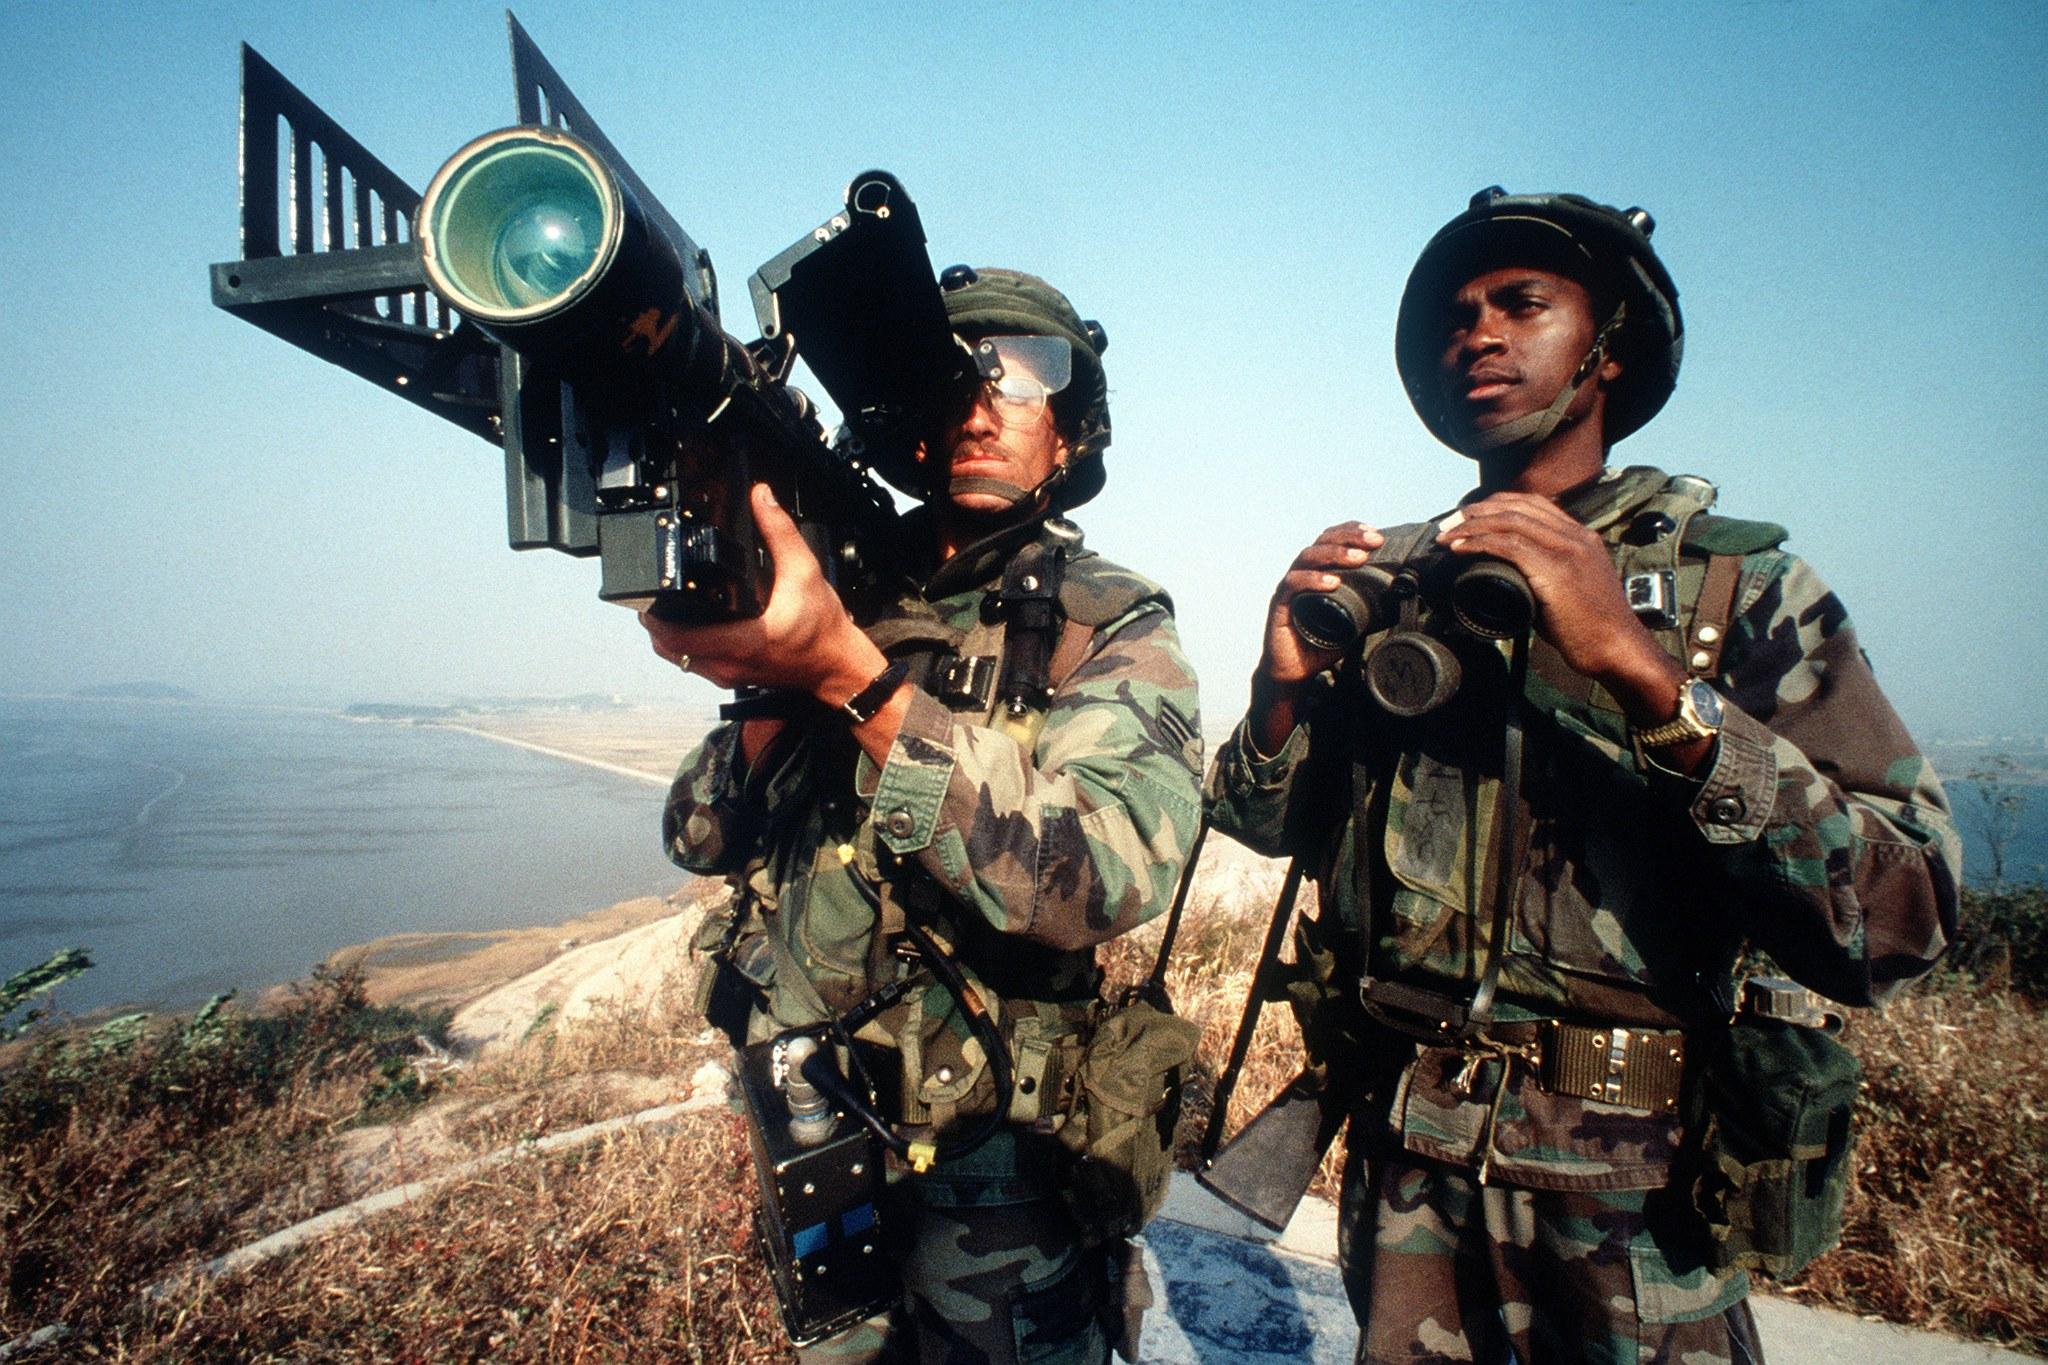 مقتل جندي مغربي ضمن قوات حفظ السلام بإفريقيا الوسطى